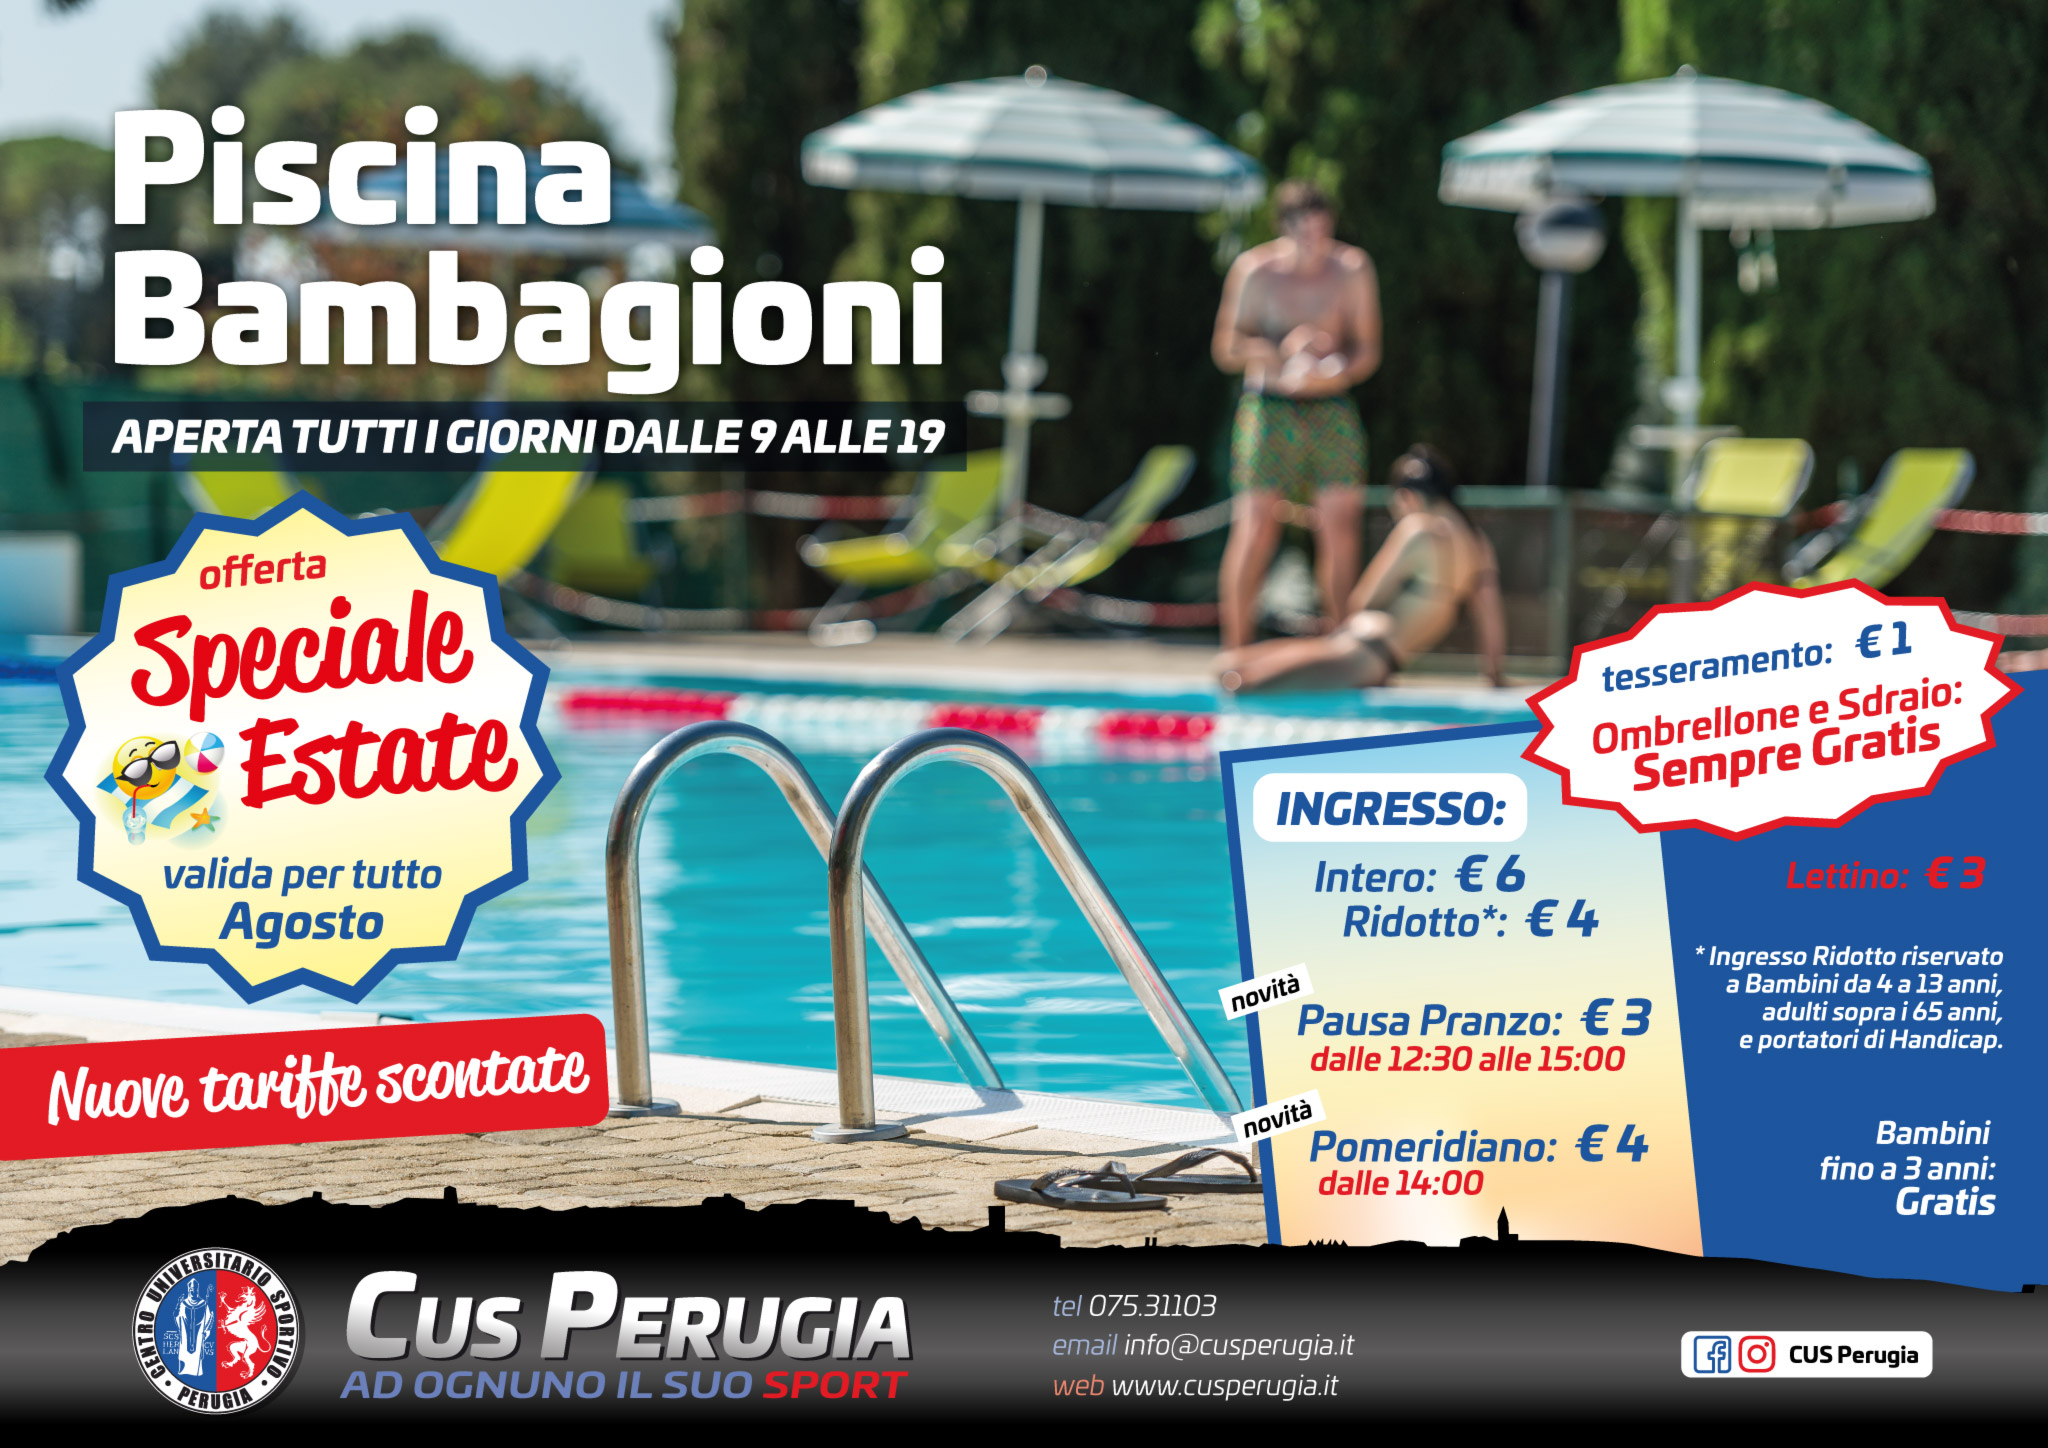 Promo Piscina Bambagioni Agosto 2018